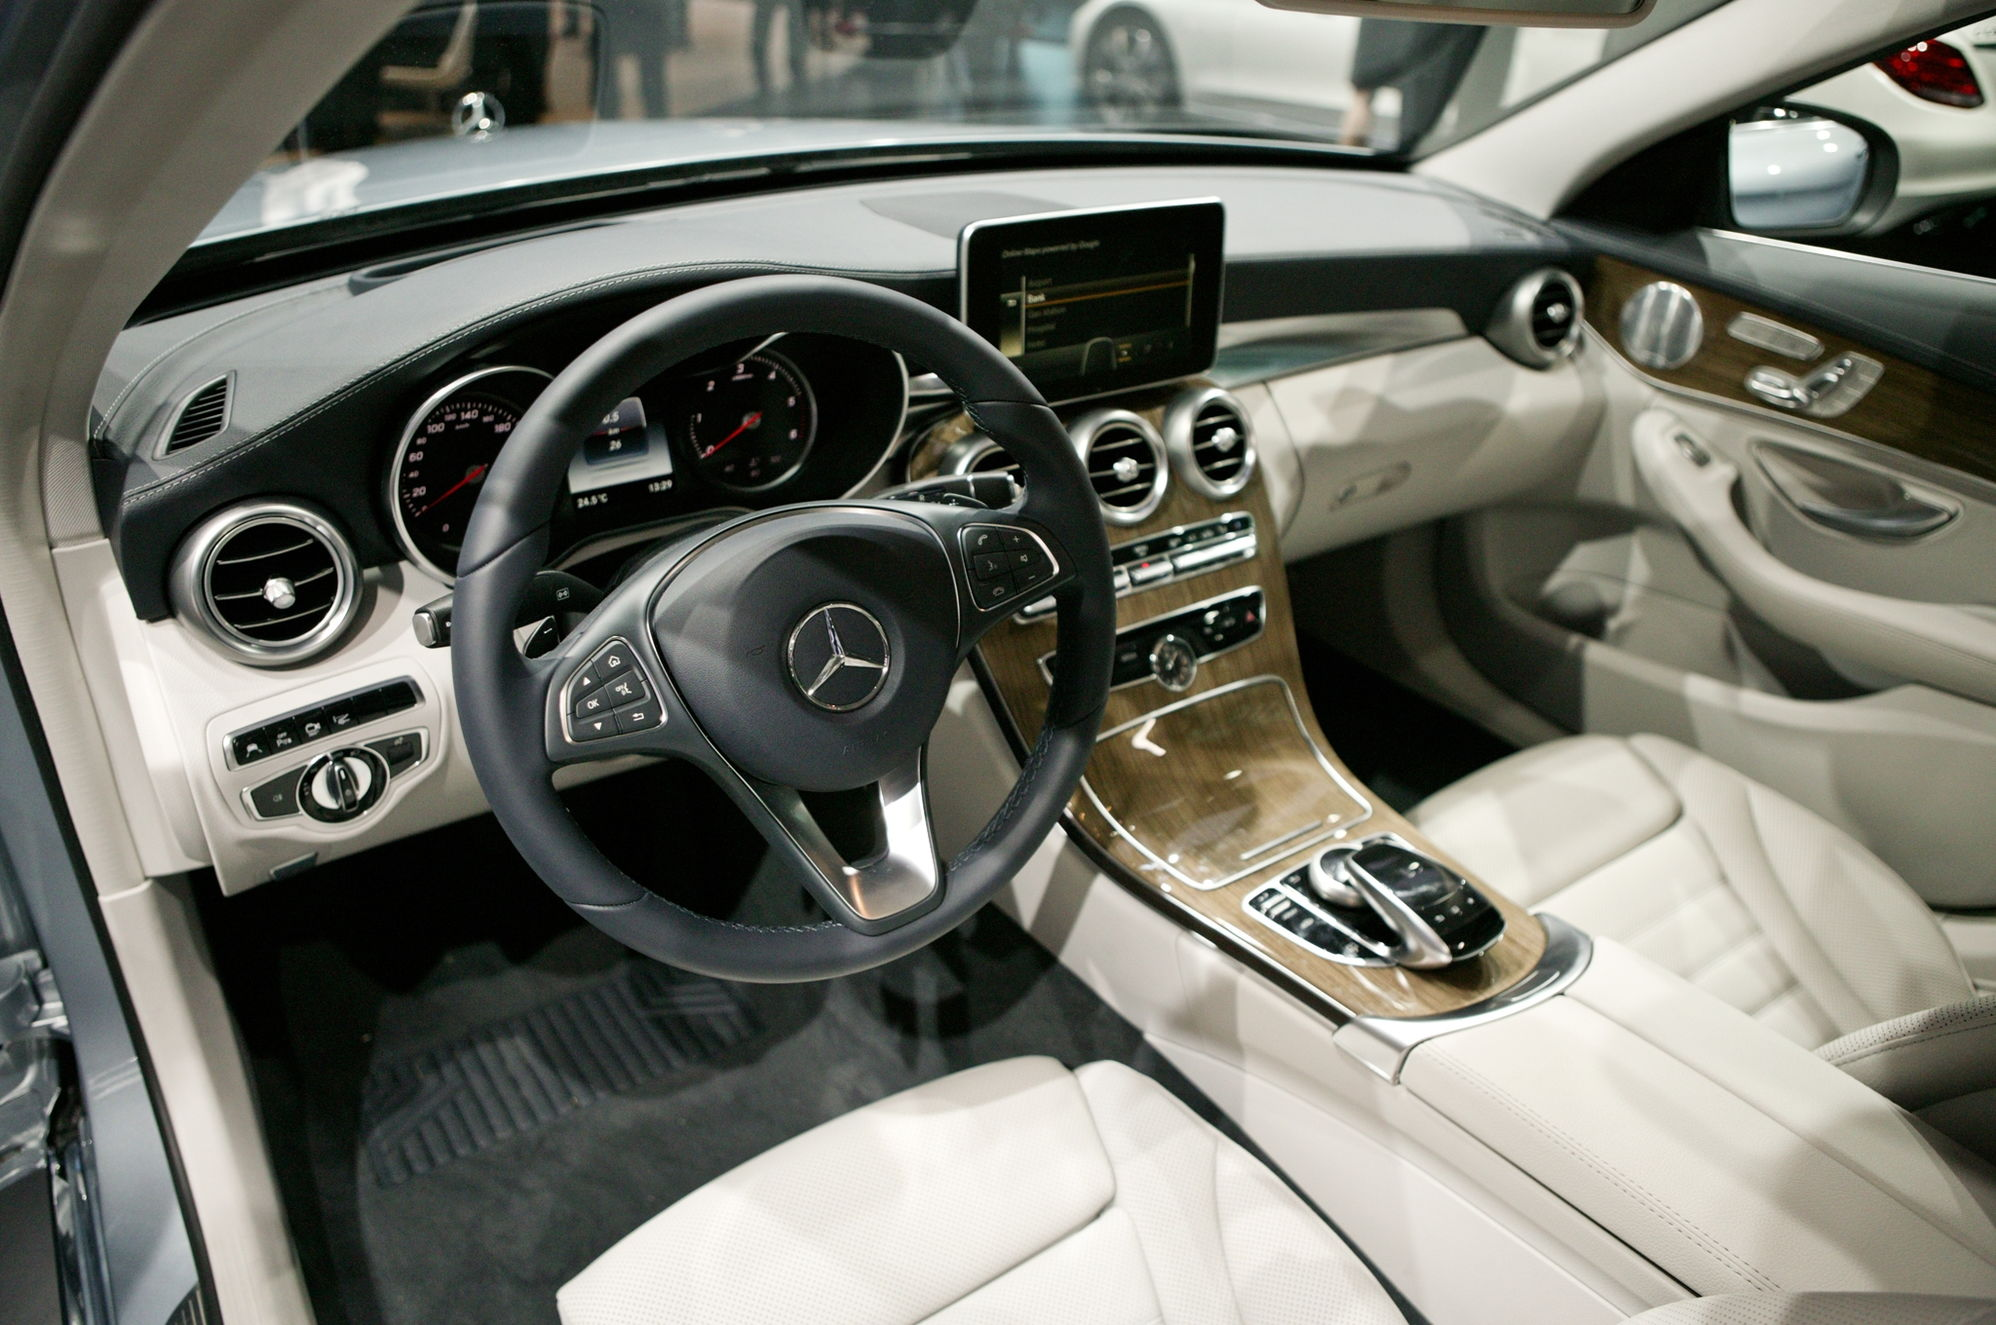 2017 mercedes benz gls clublexus lexus forum discussion for Mercedes benz c class 2015 interior